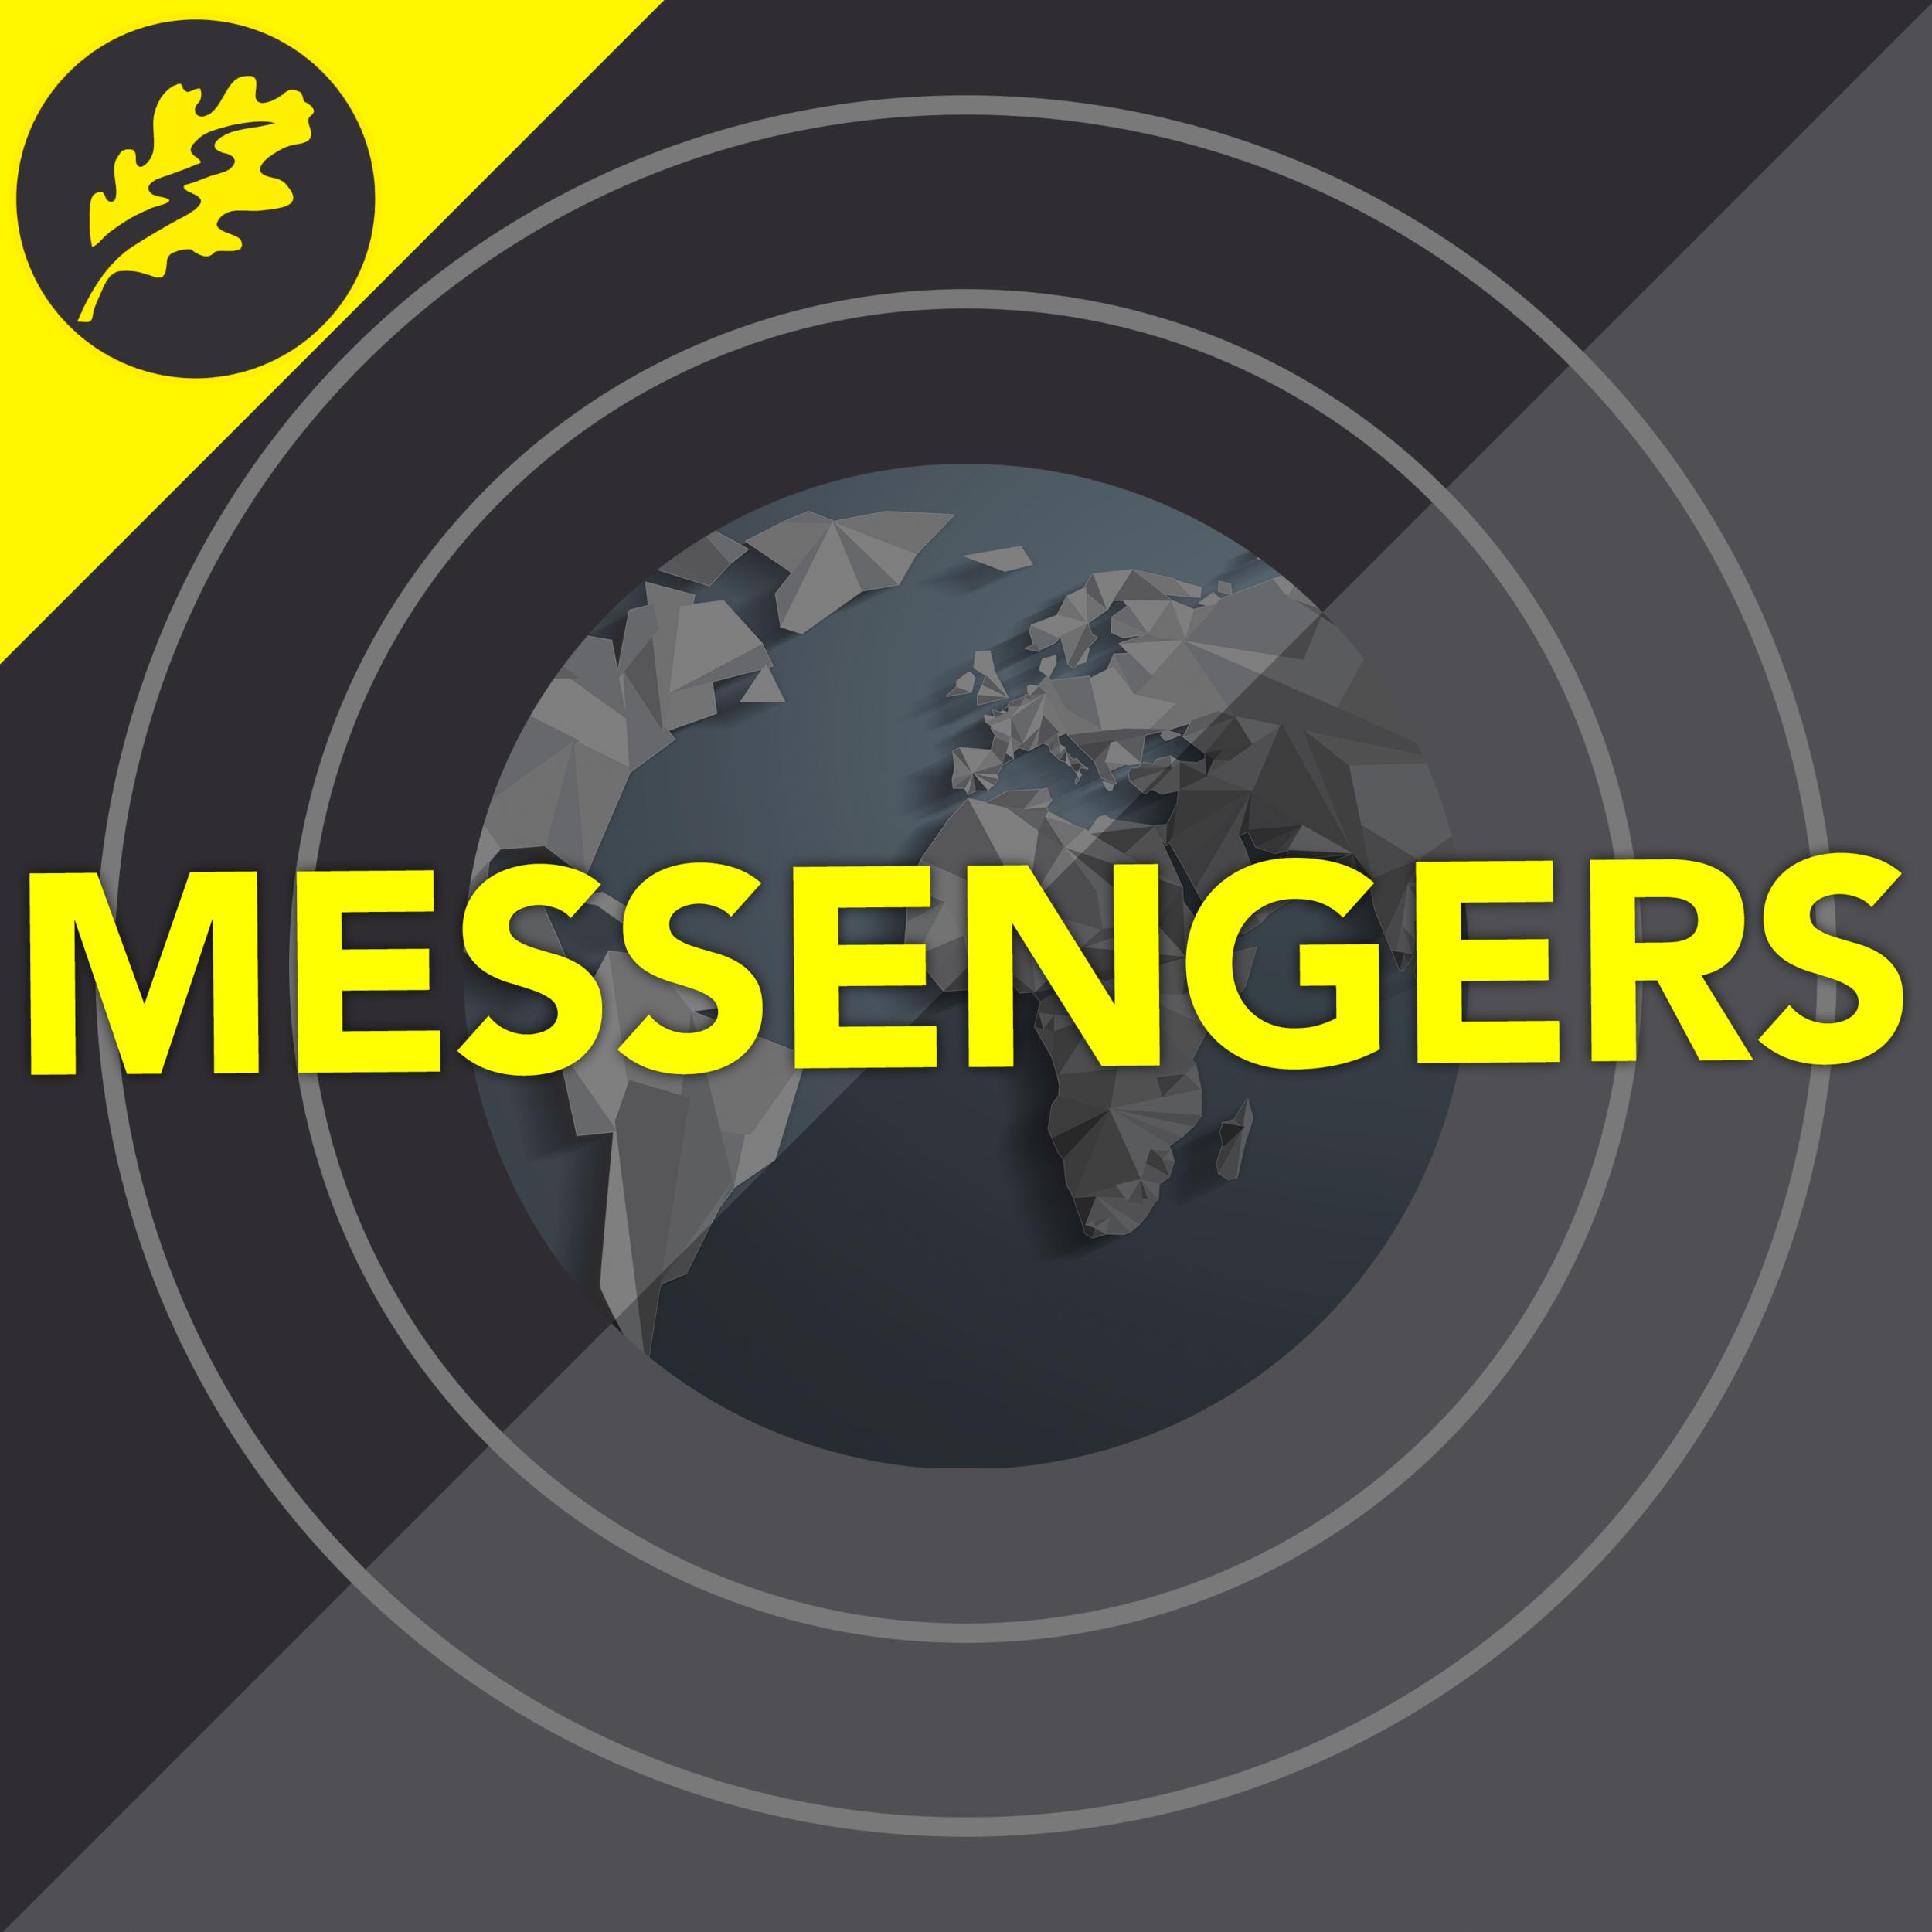 messengers artwork.png